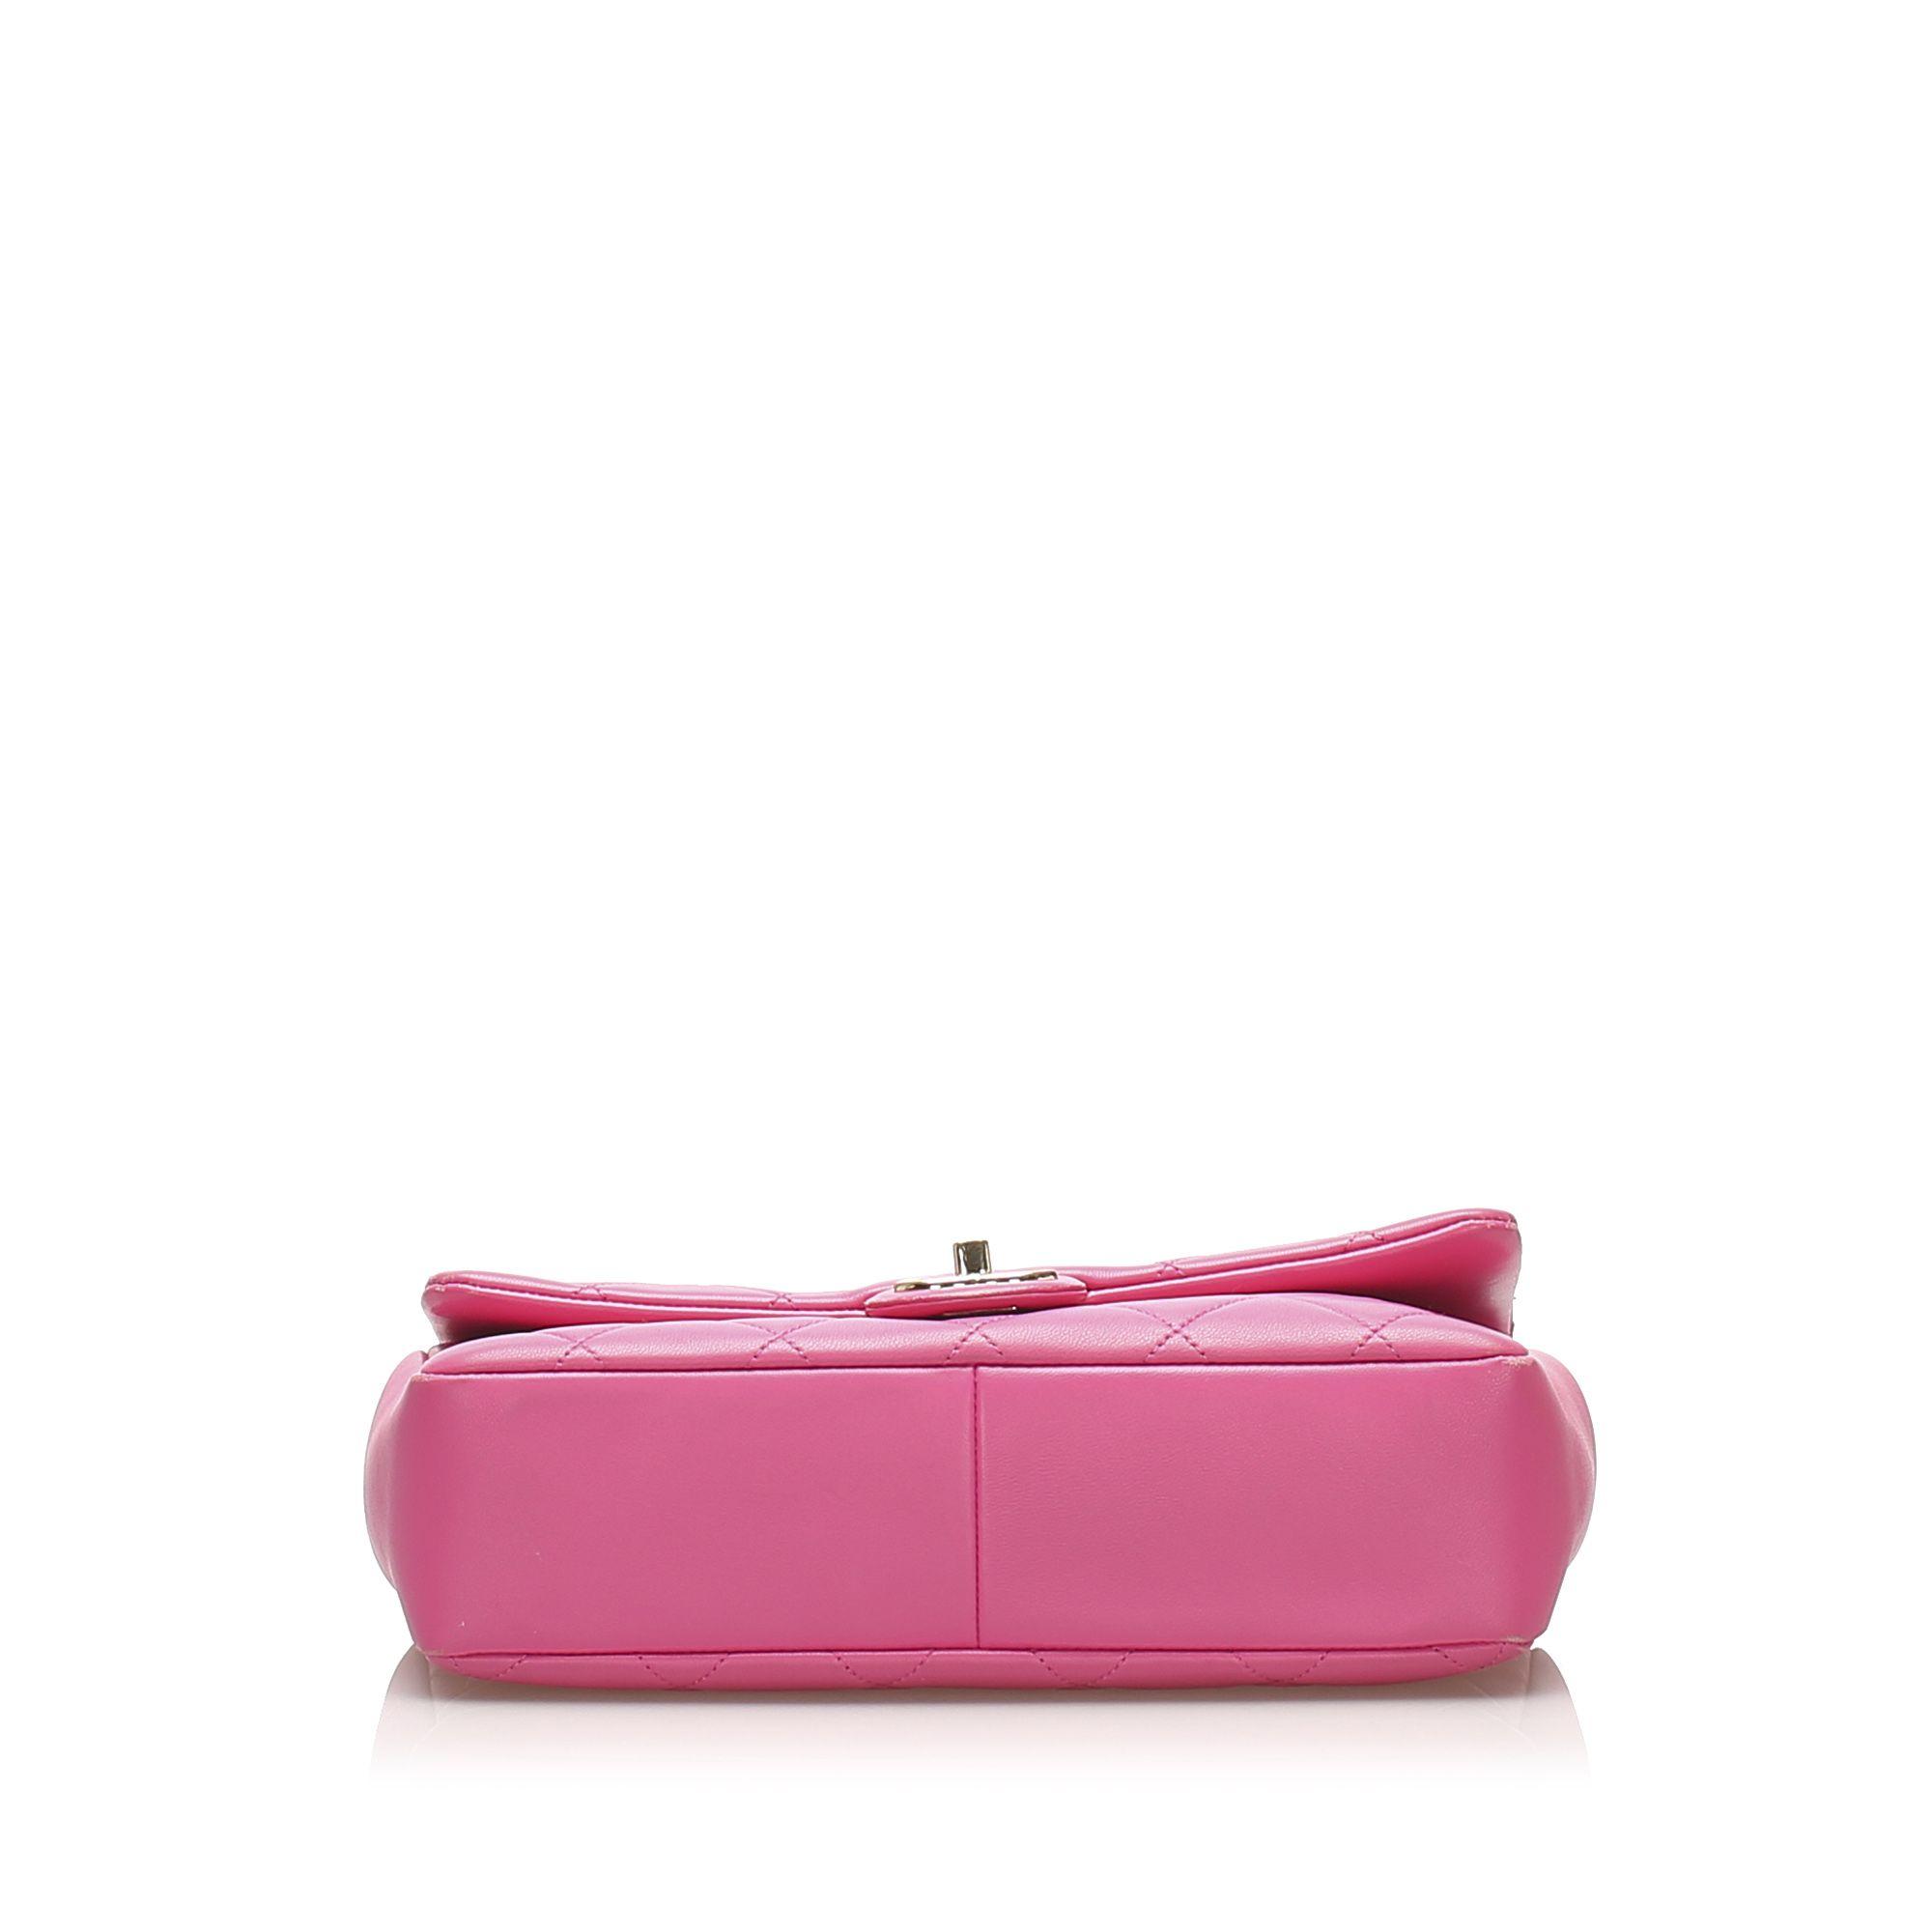 Vintage Chanel Medium Lambskin Leather Bicolor Chain Flap Bag Pink